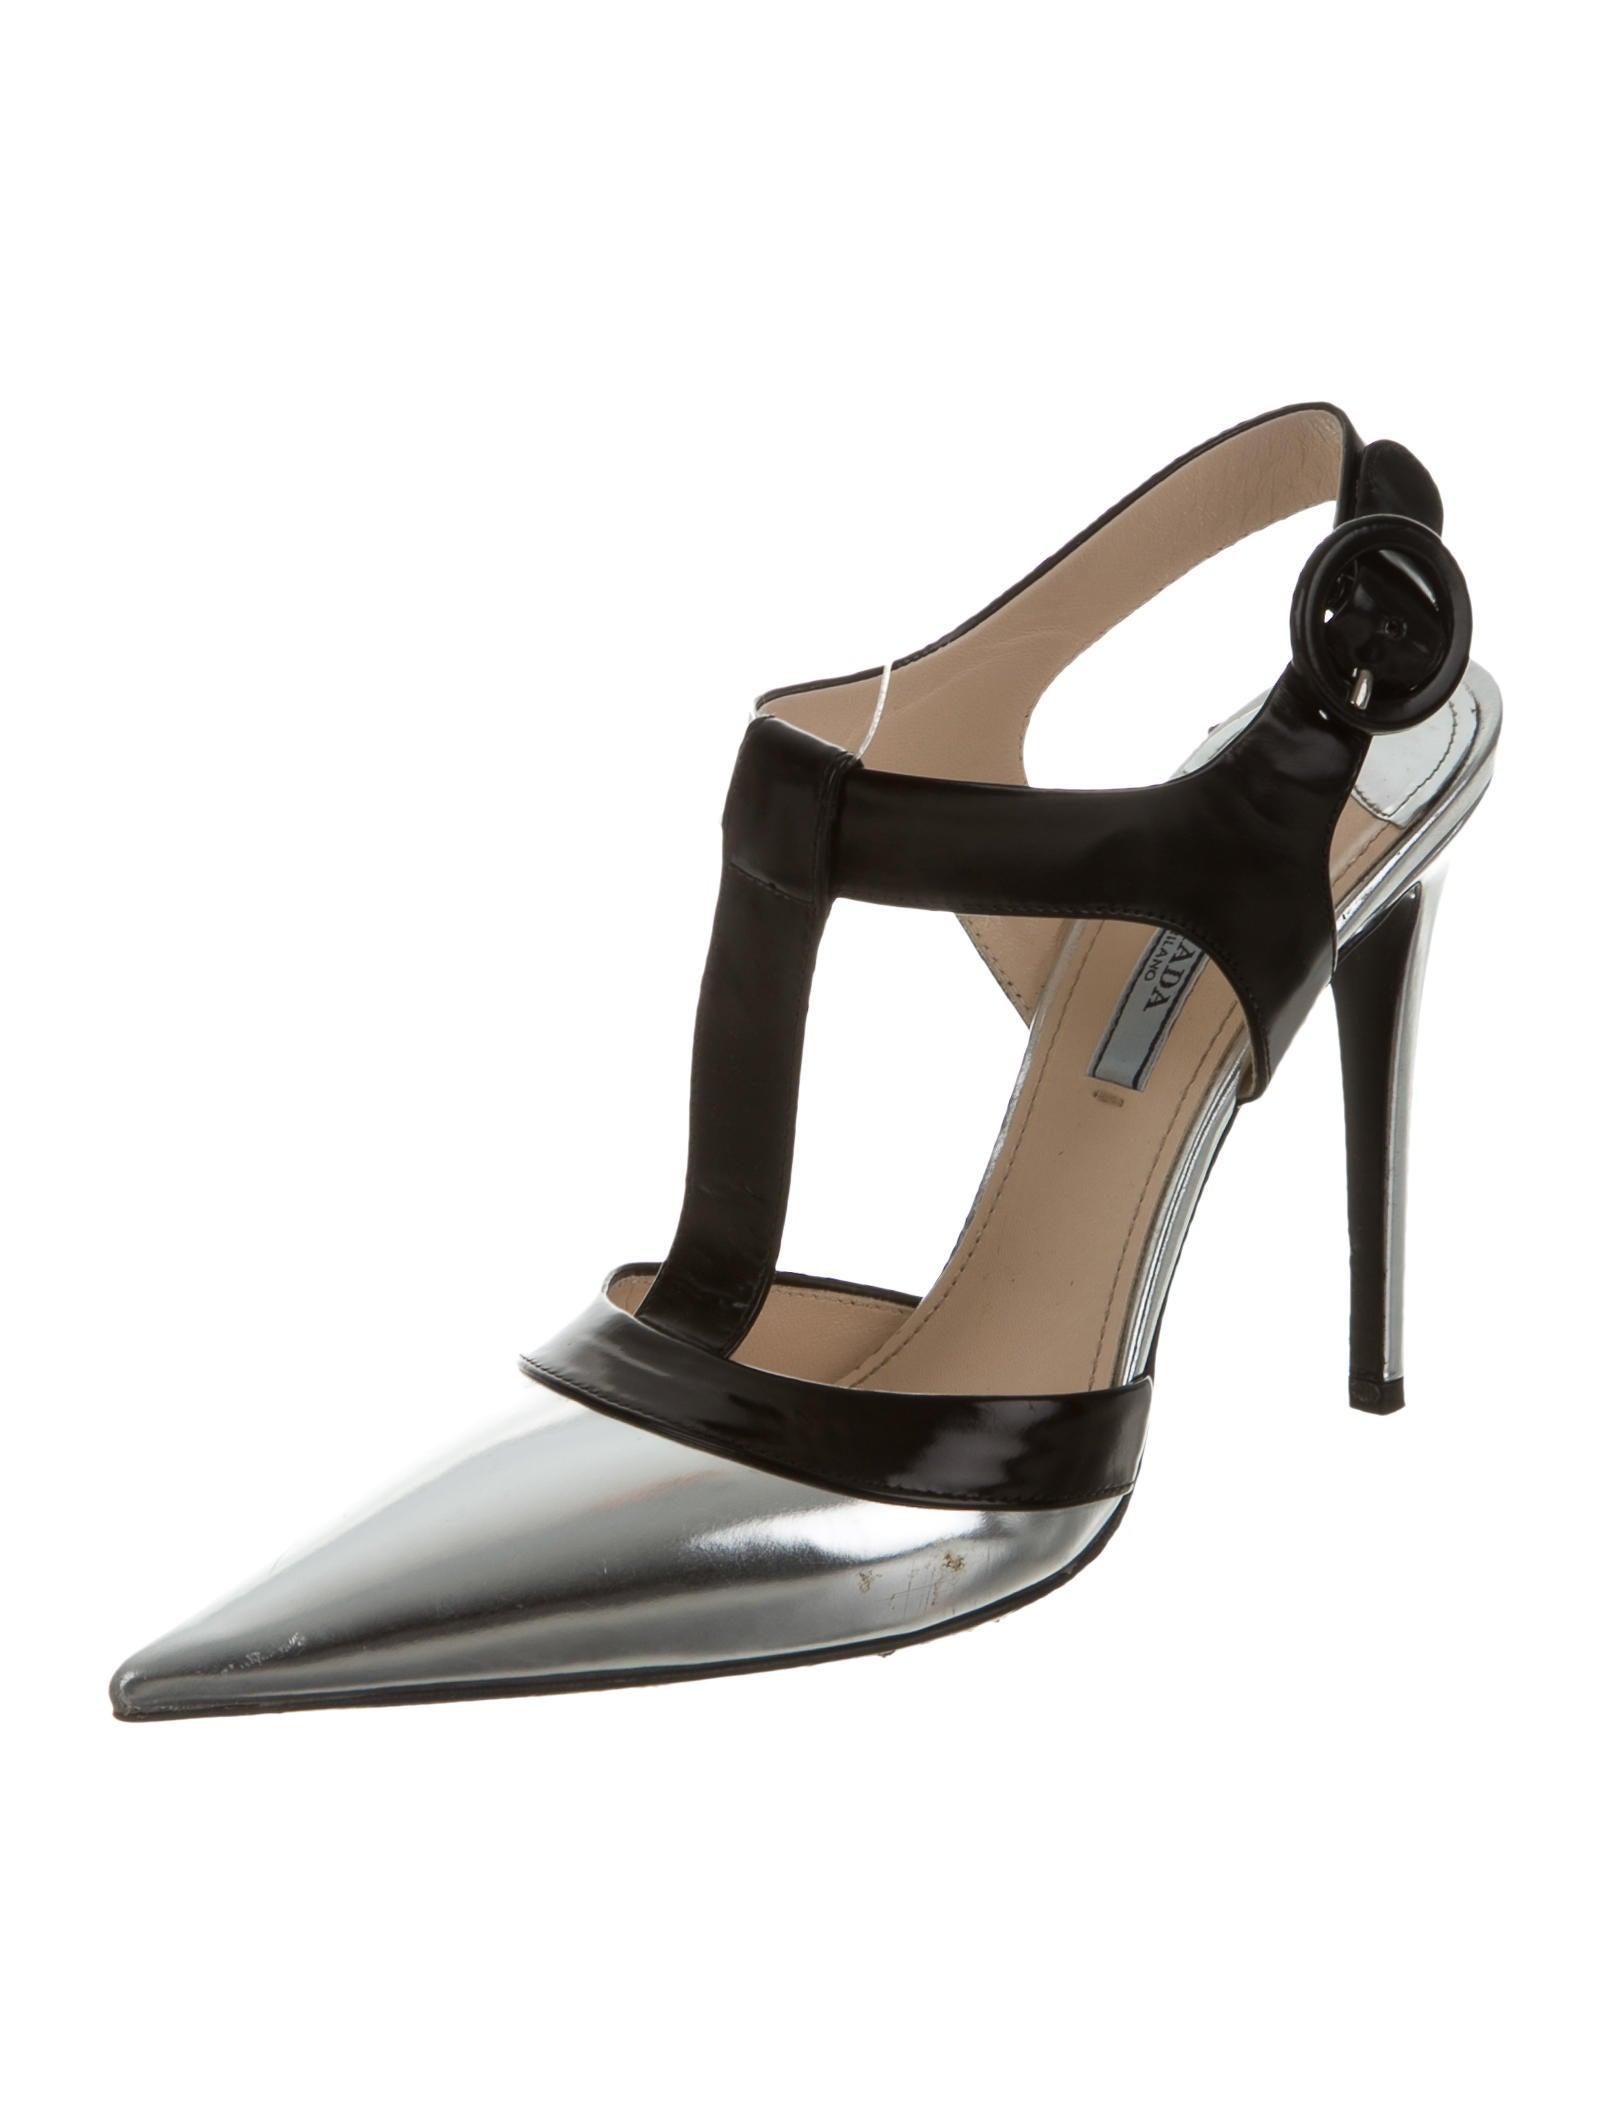 prada leather t strap pumps shoes pra124765 the realreal. Black Bedroom Furniture Sets. Home Design Ideas